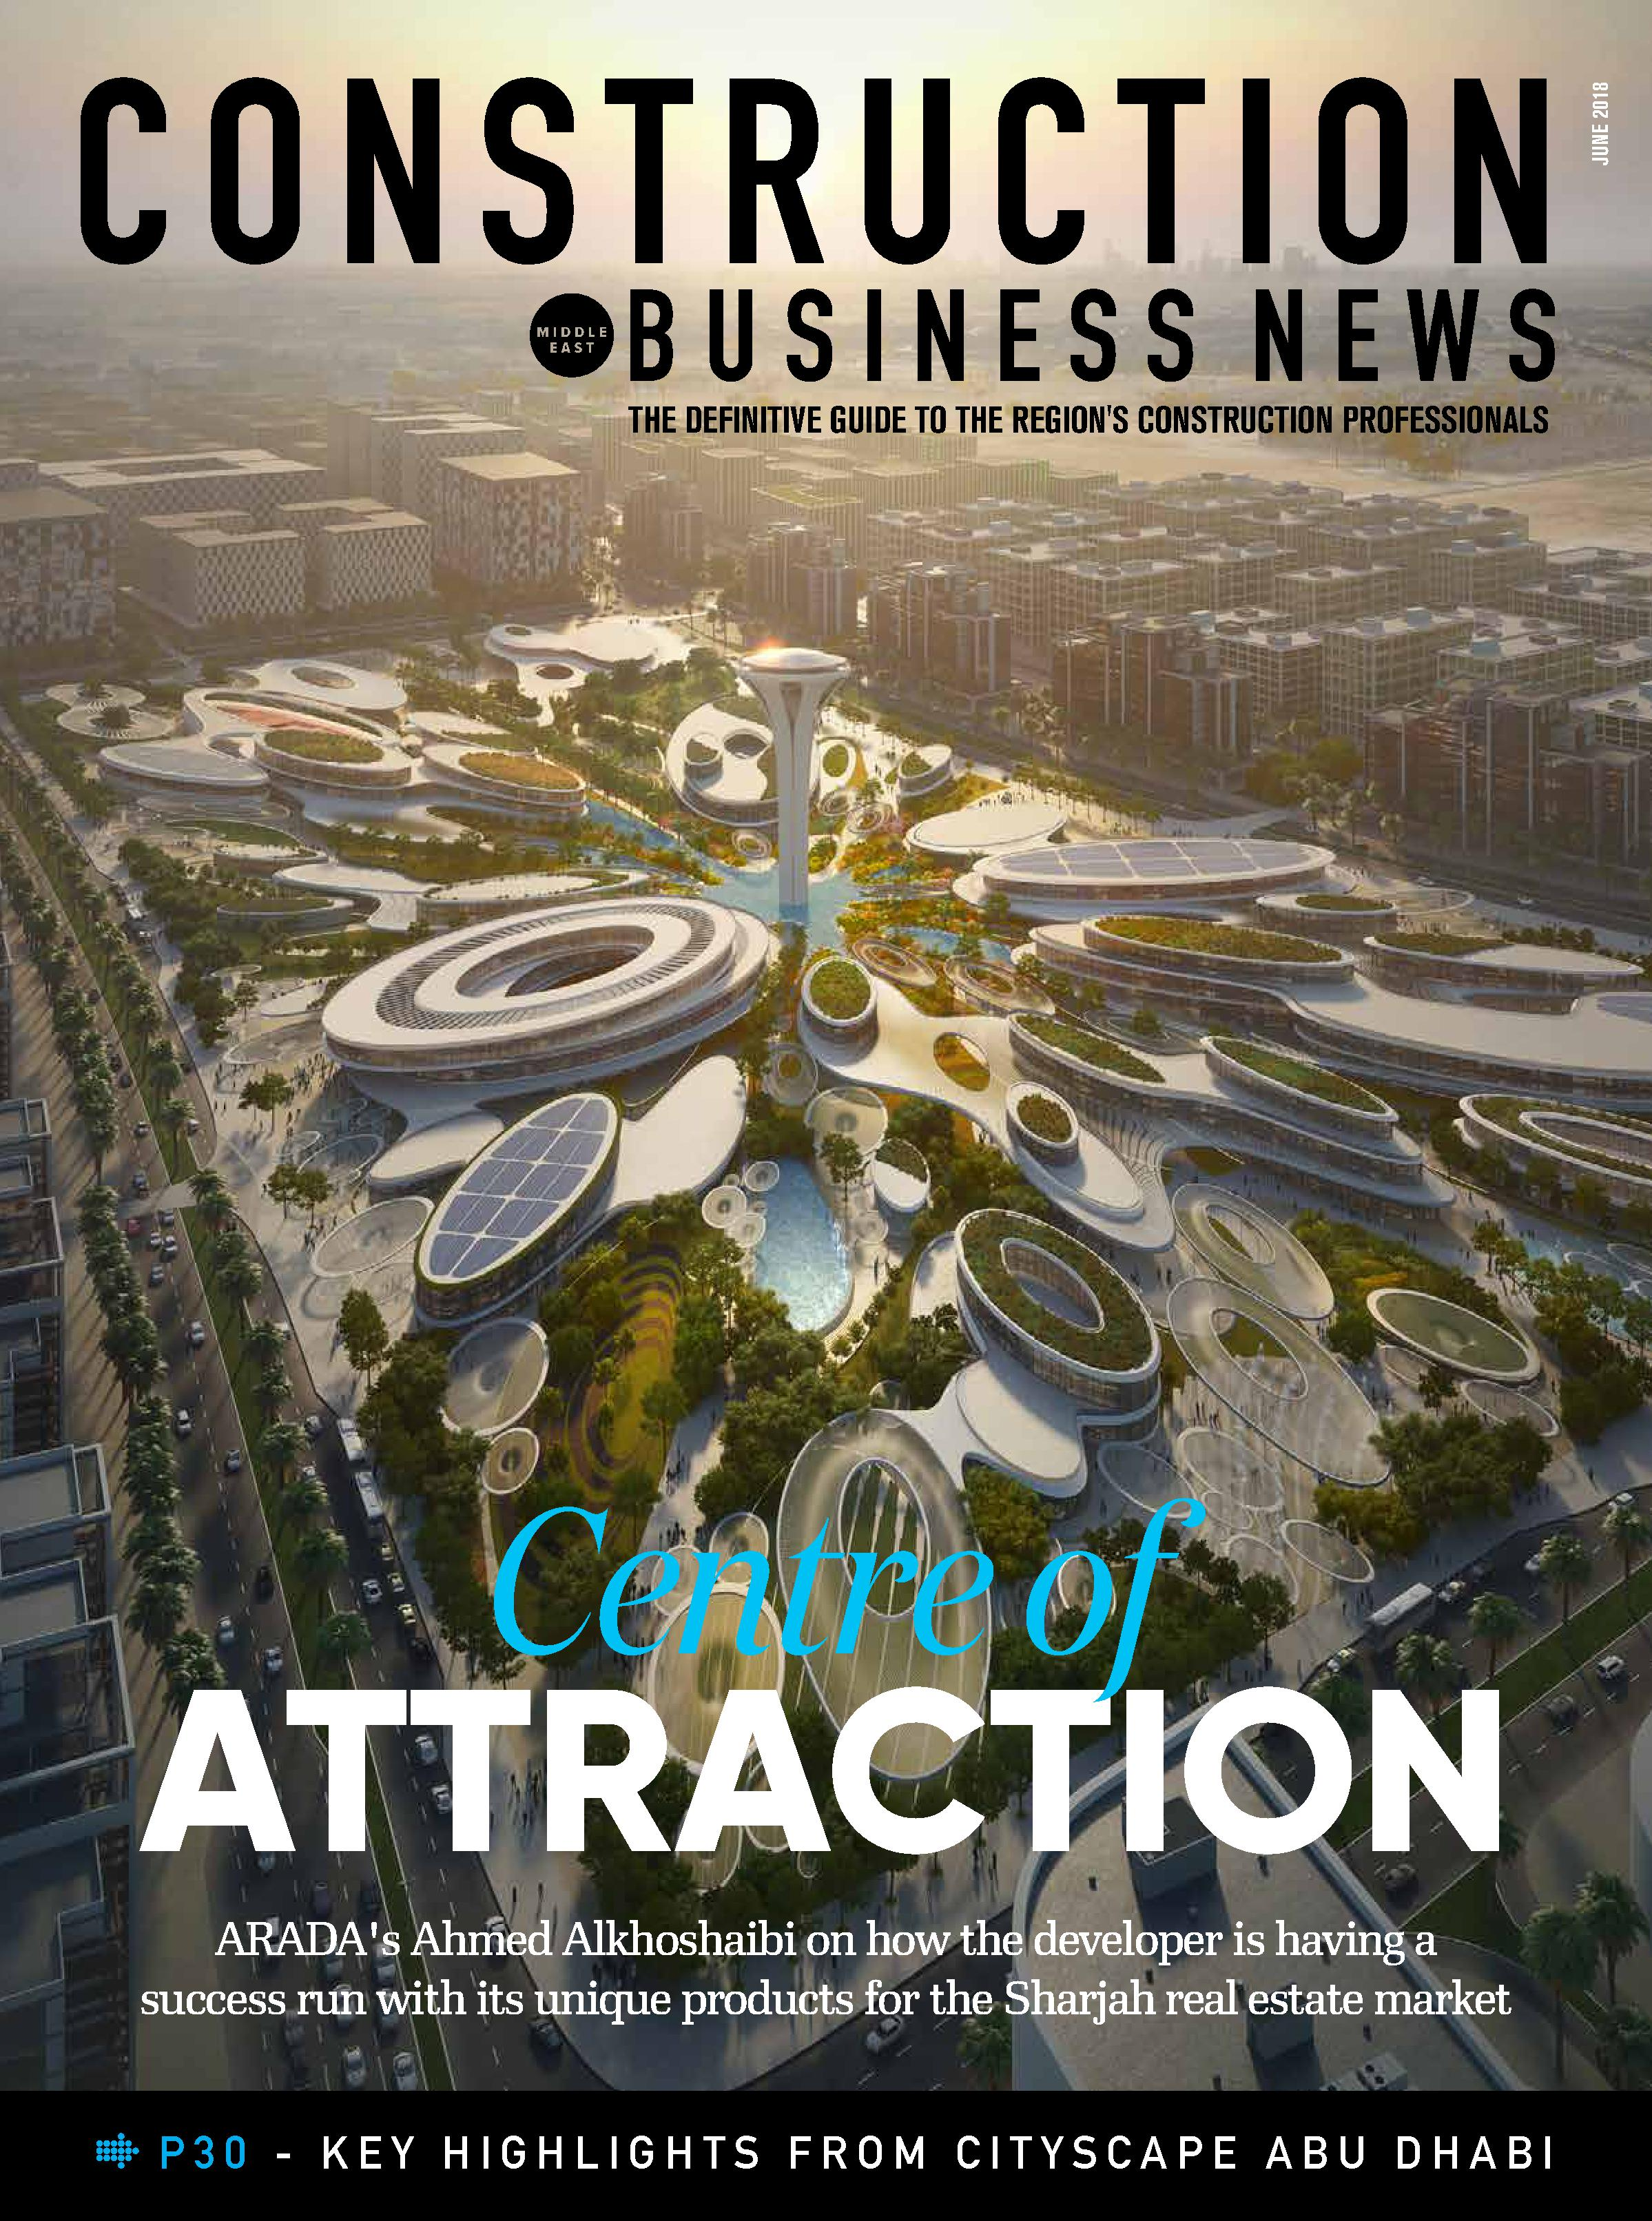 http://www.cbnme.com/magazines/construction-business-news-june-2018/